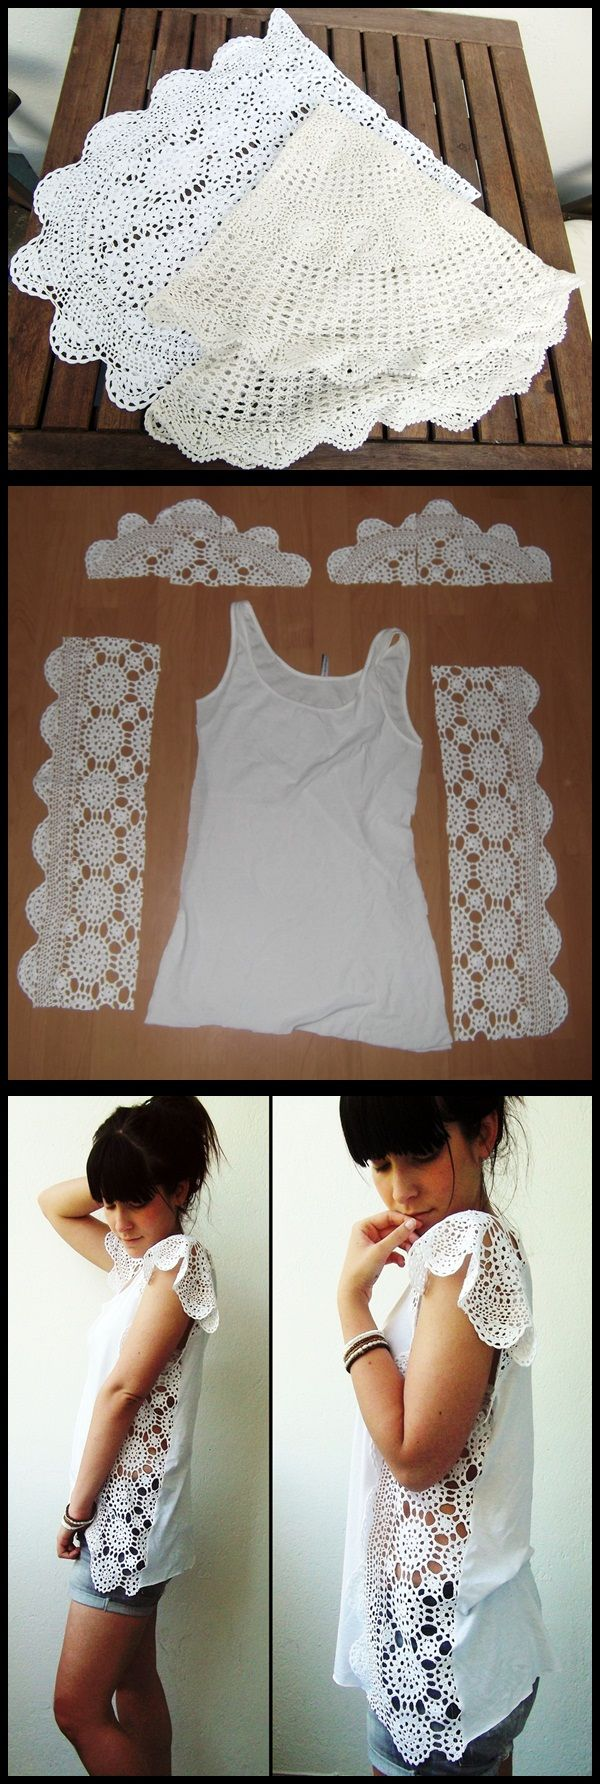 Crochetshirt from www.jestil.blogspot.com | crafts | Pinterest ...